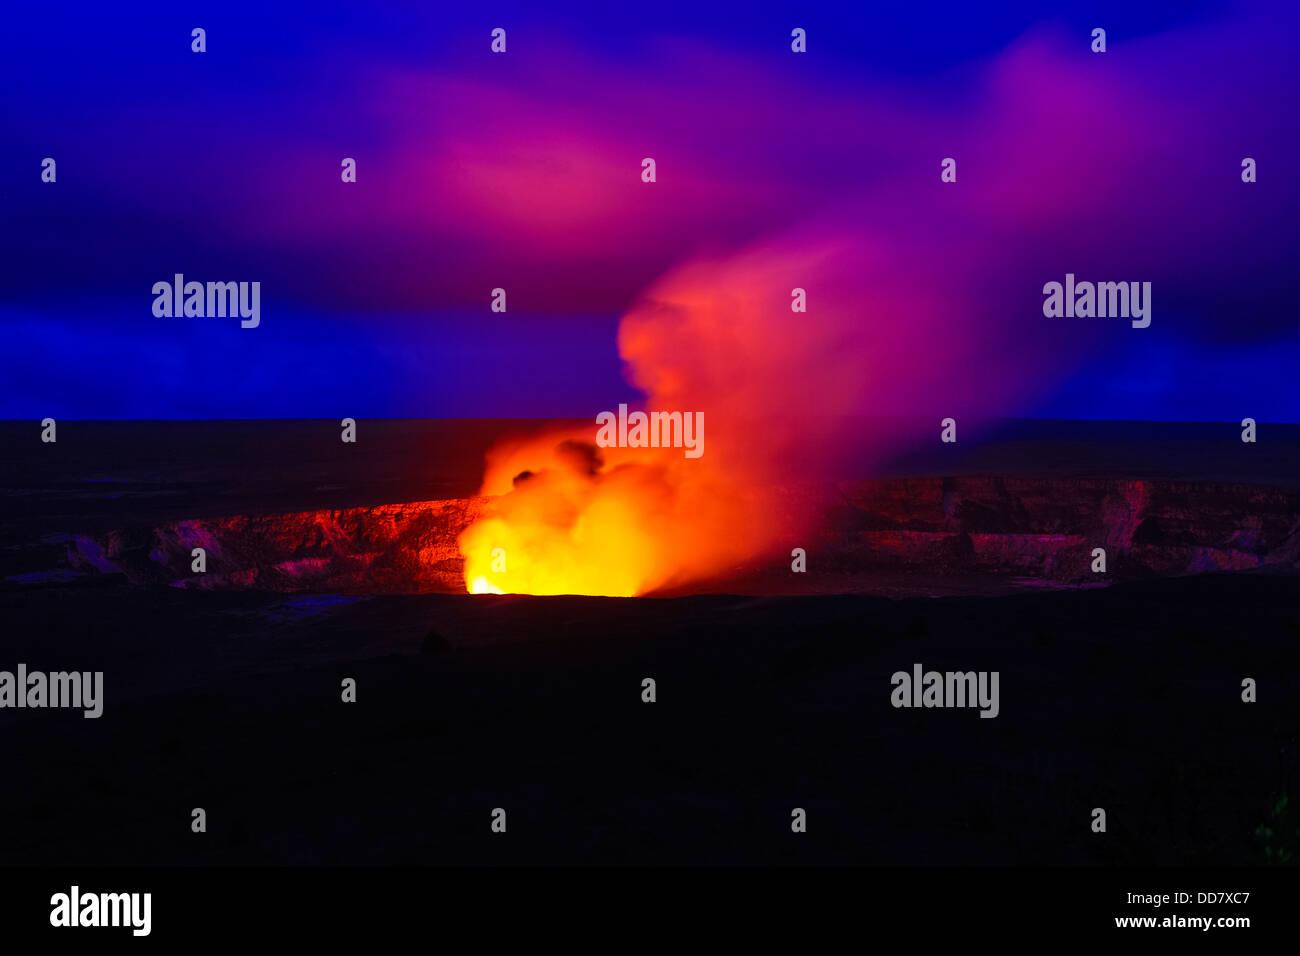 Halemaumau Crater, Erupting, Hawaii Volcanoes National Park, Island of Hawaii - Stock Image